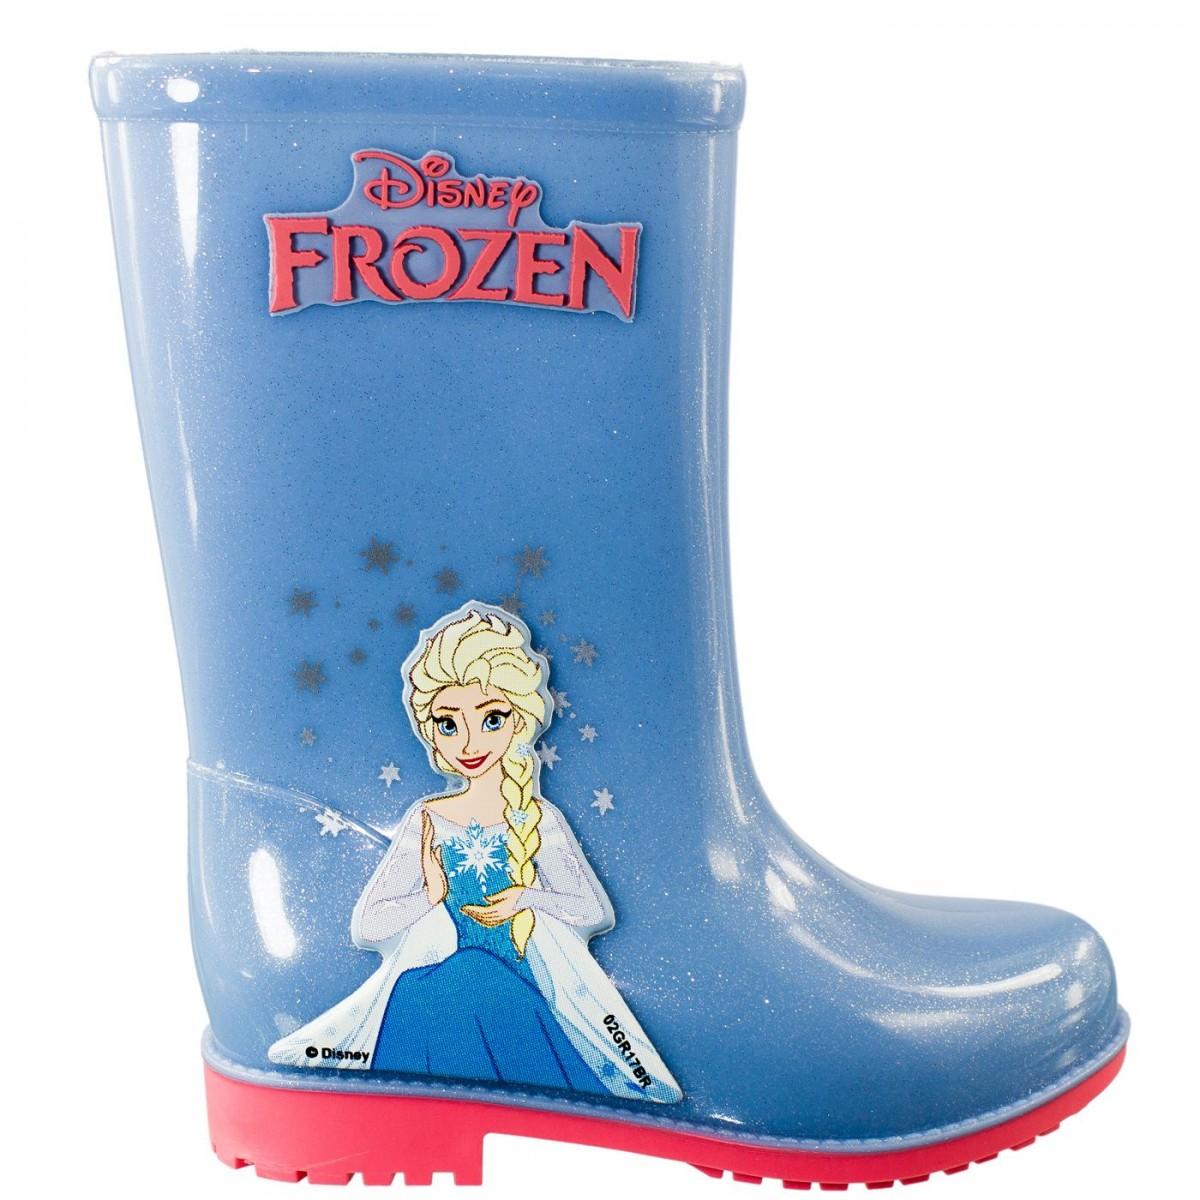 46cea1f02 Bizz Store - Galocha Infantil Menina Grendene Dreams Frozen